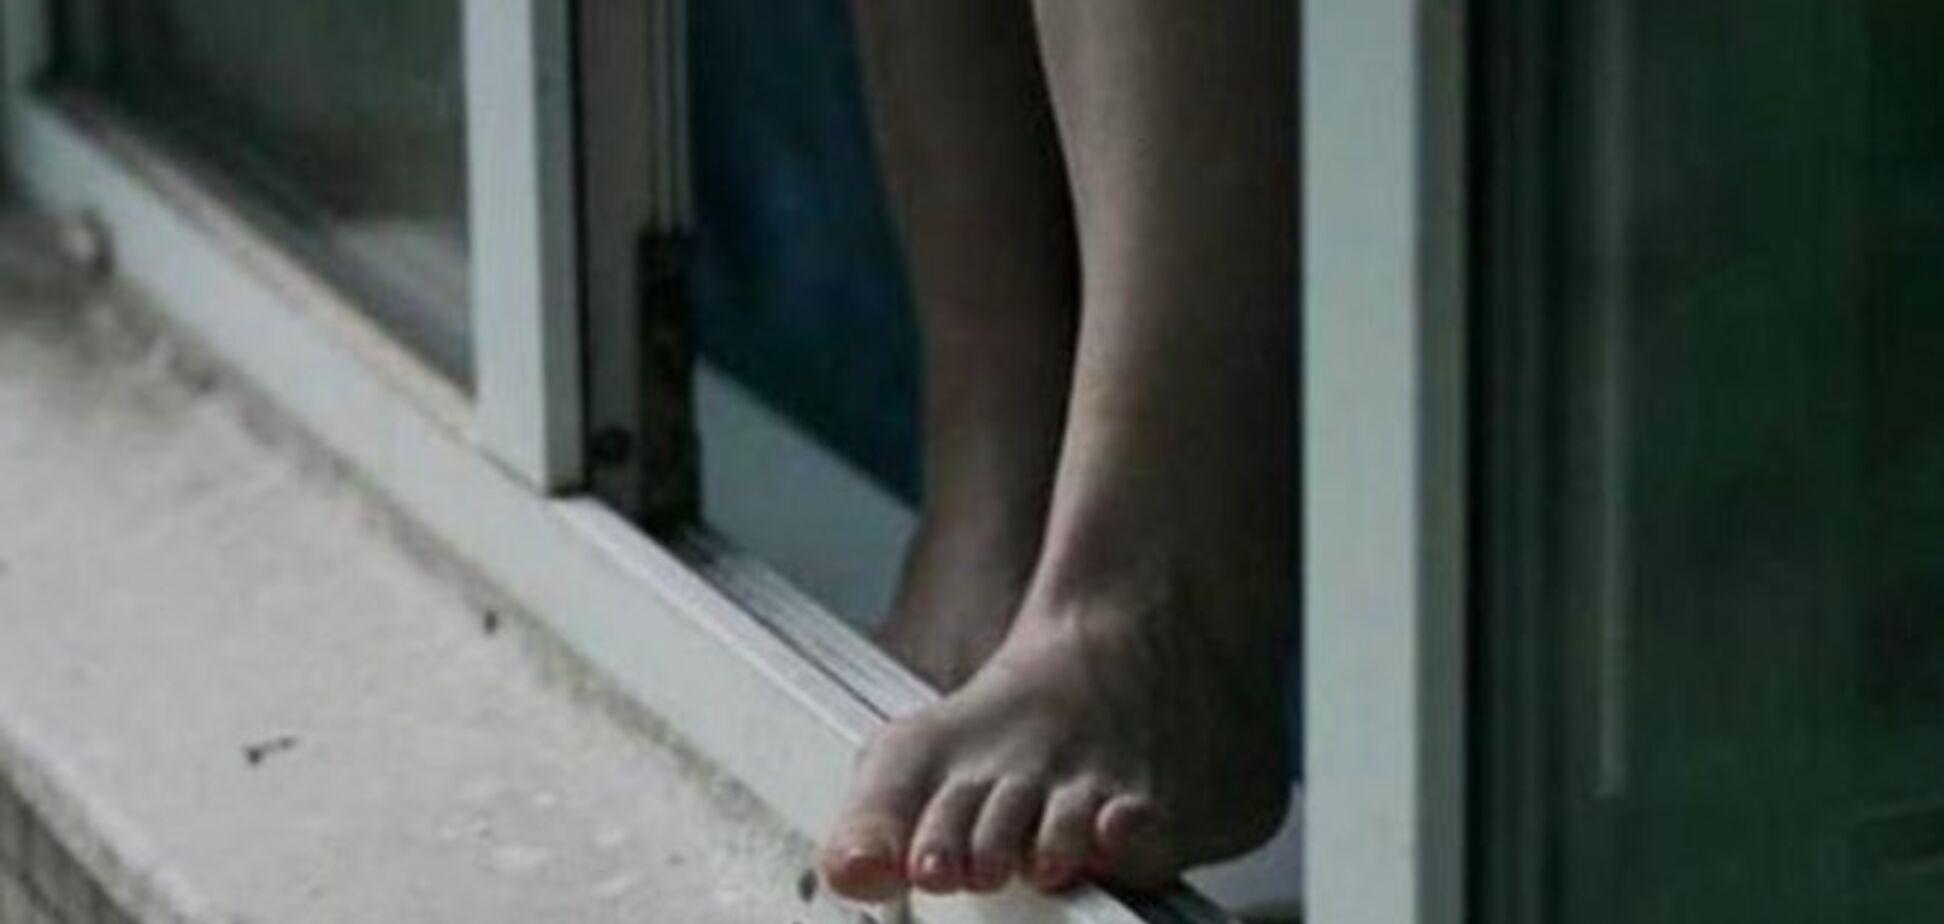 В Черкассах коп спас 20-летнюю девушку от самоубийства. Фото, видео